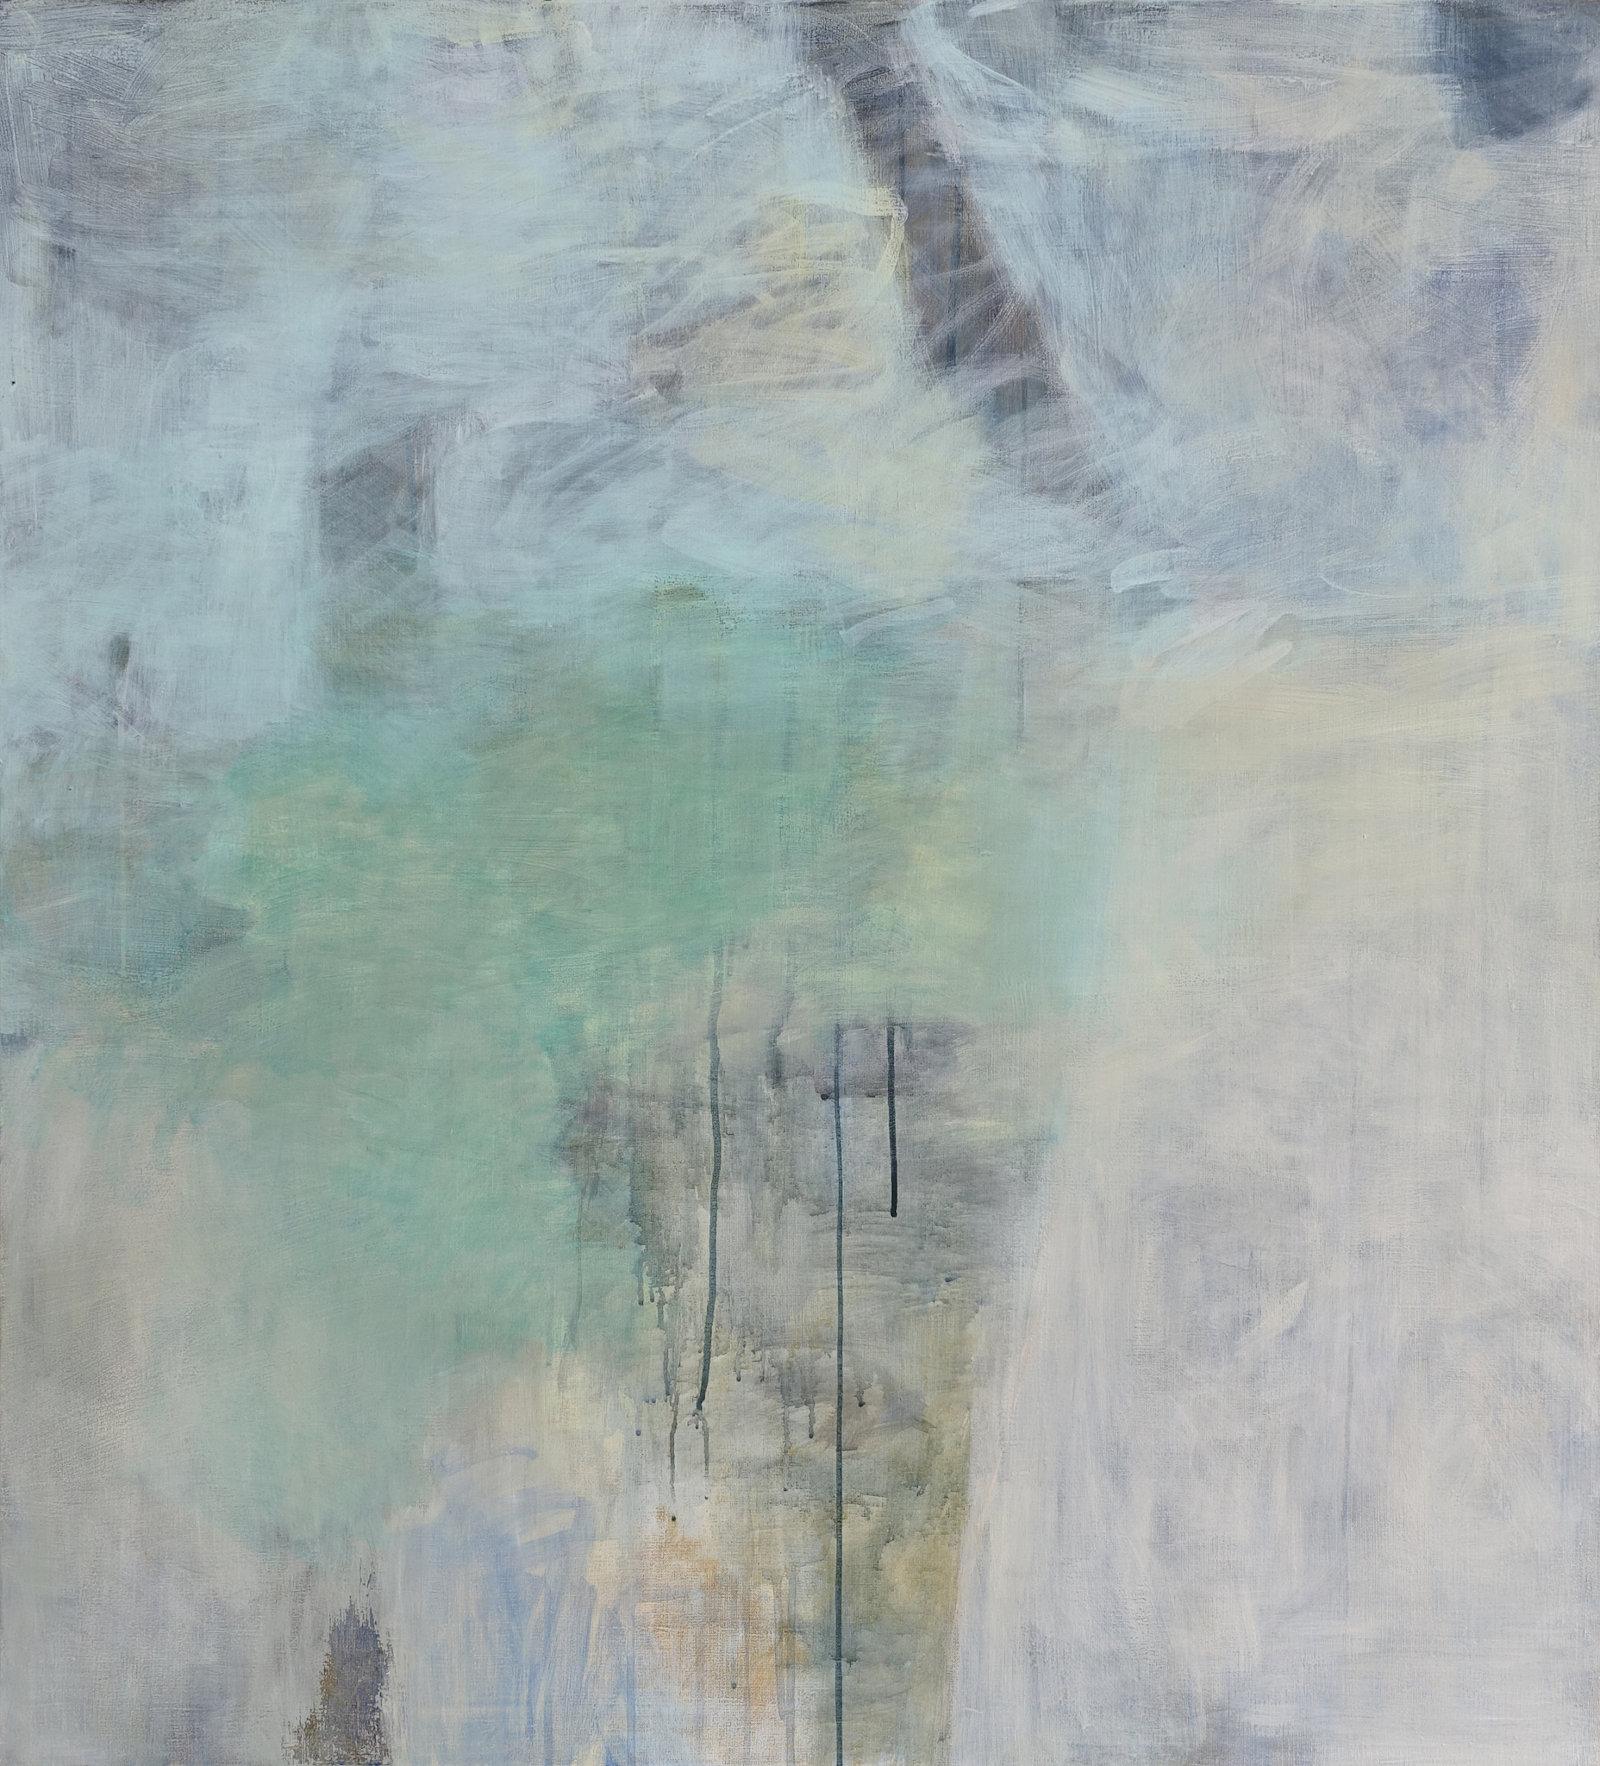 Vuoto, 2016, tempera, 110 x 100 cm